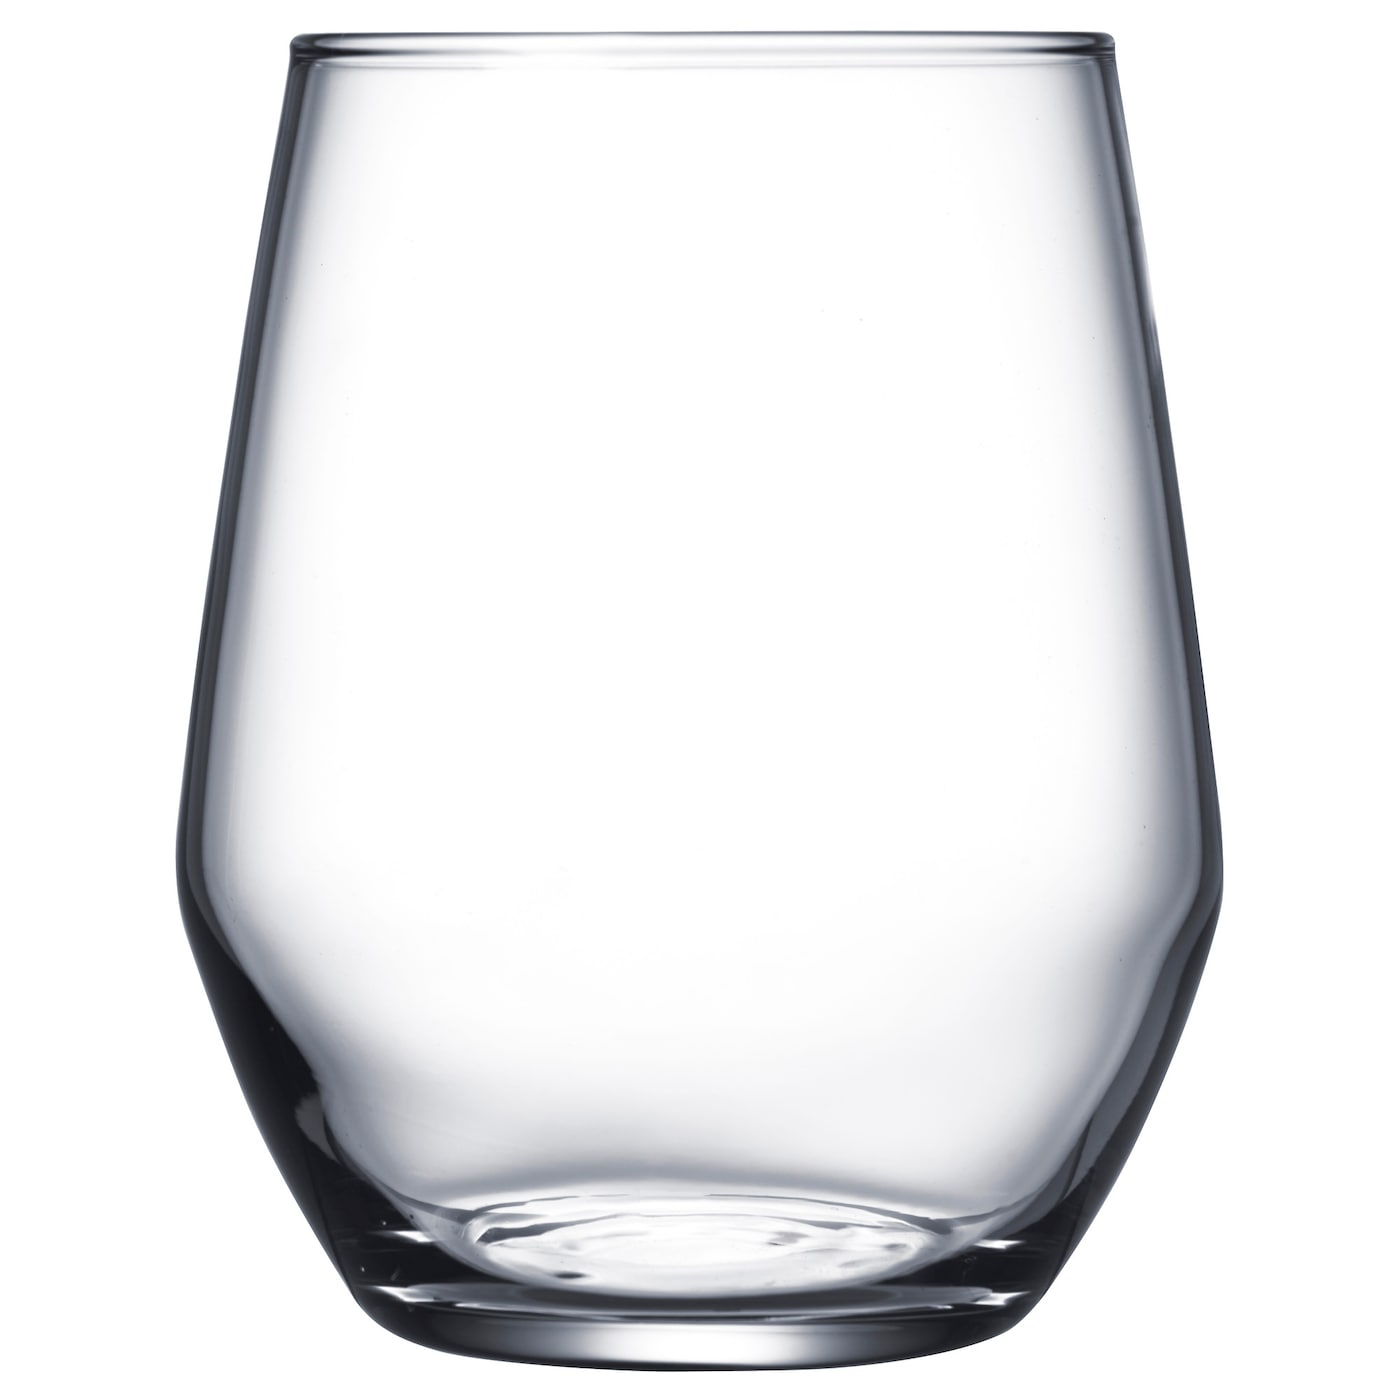 verre stunning verre bire demipinte with verre beautiful verre martini tube vas with verre. Black Bedroom Furniture Sets. Home Design Ideas